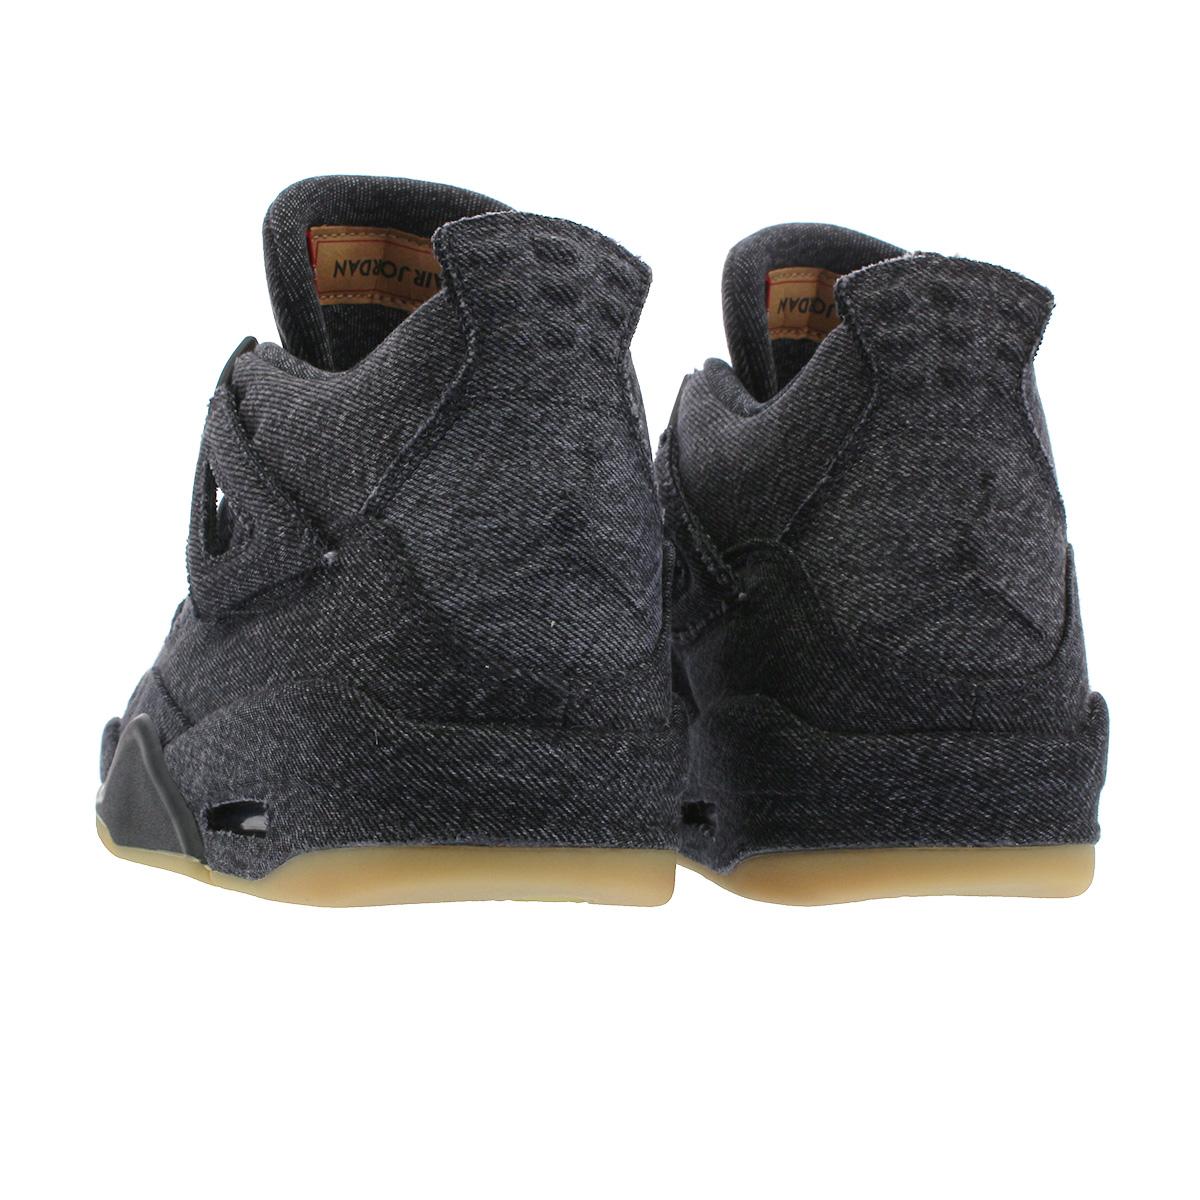 competitive price 1c8a5 896ee NIKE AIR JORDAN 4 RETRO Nike air Jordan 4 nostalgic NRG Levis BLACK/BLACK  ao2571-001